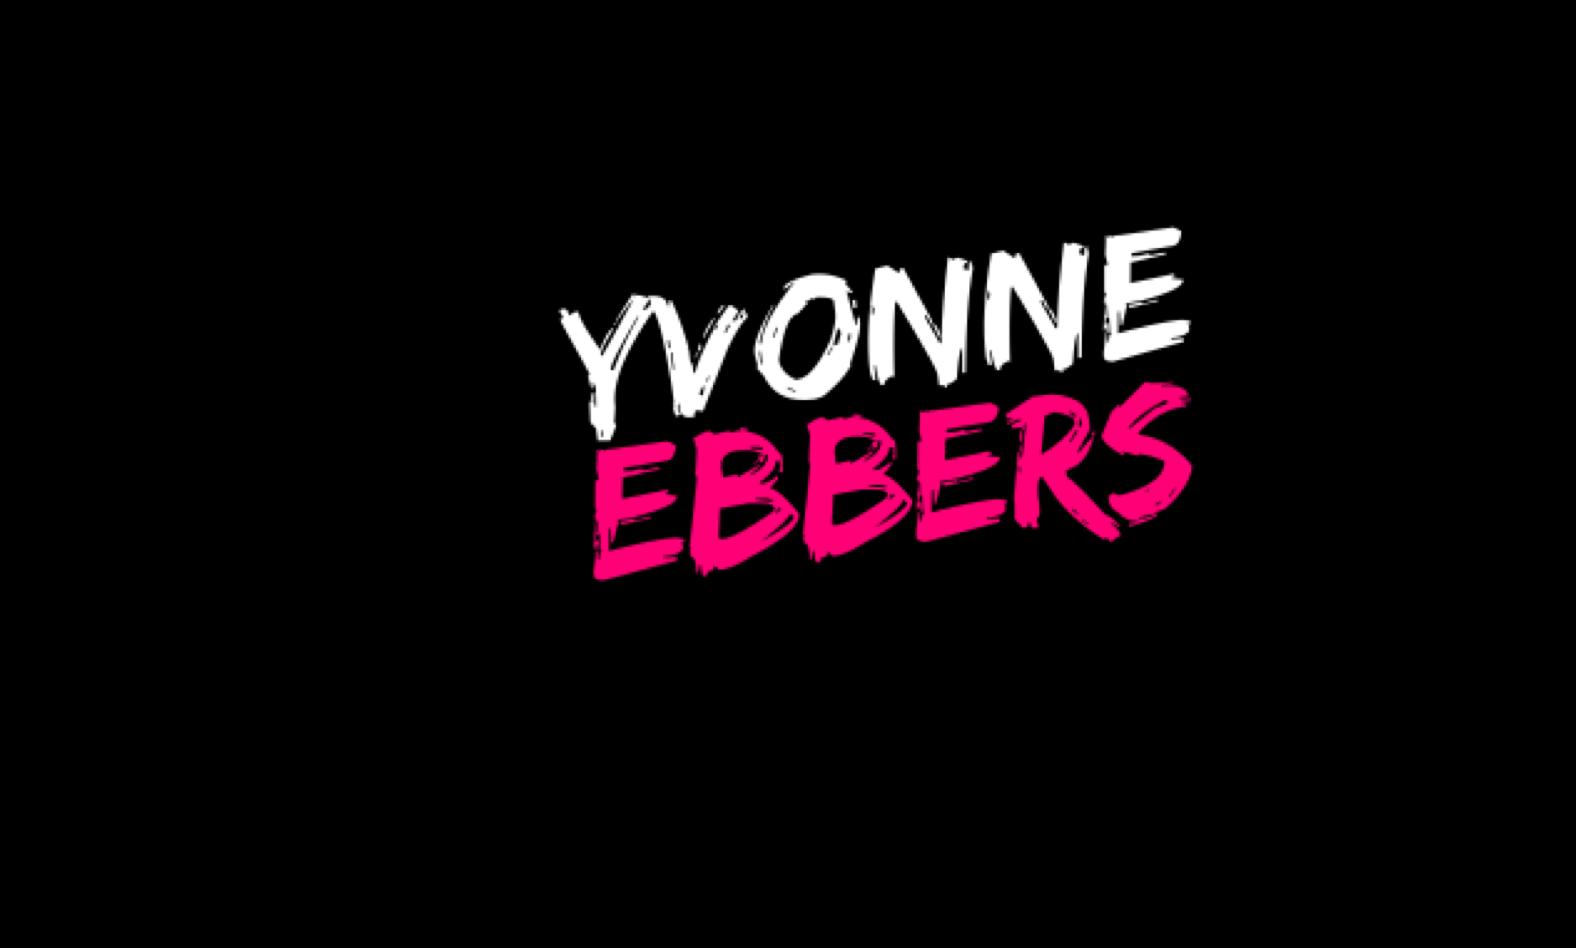 Yvonne Ebbers